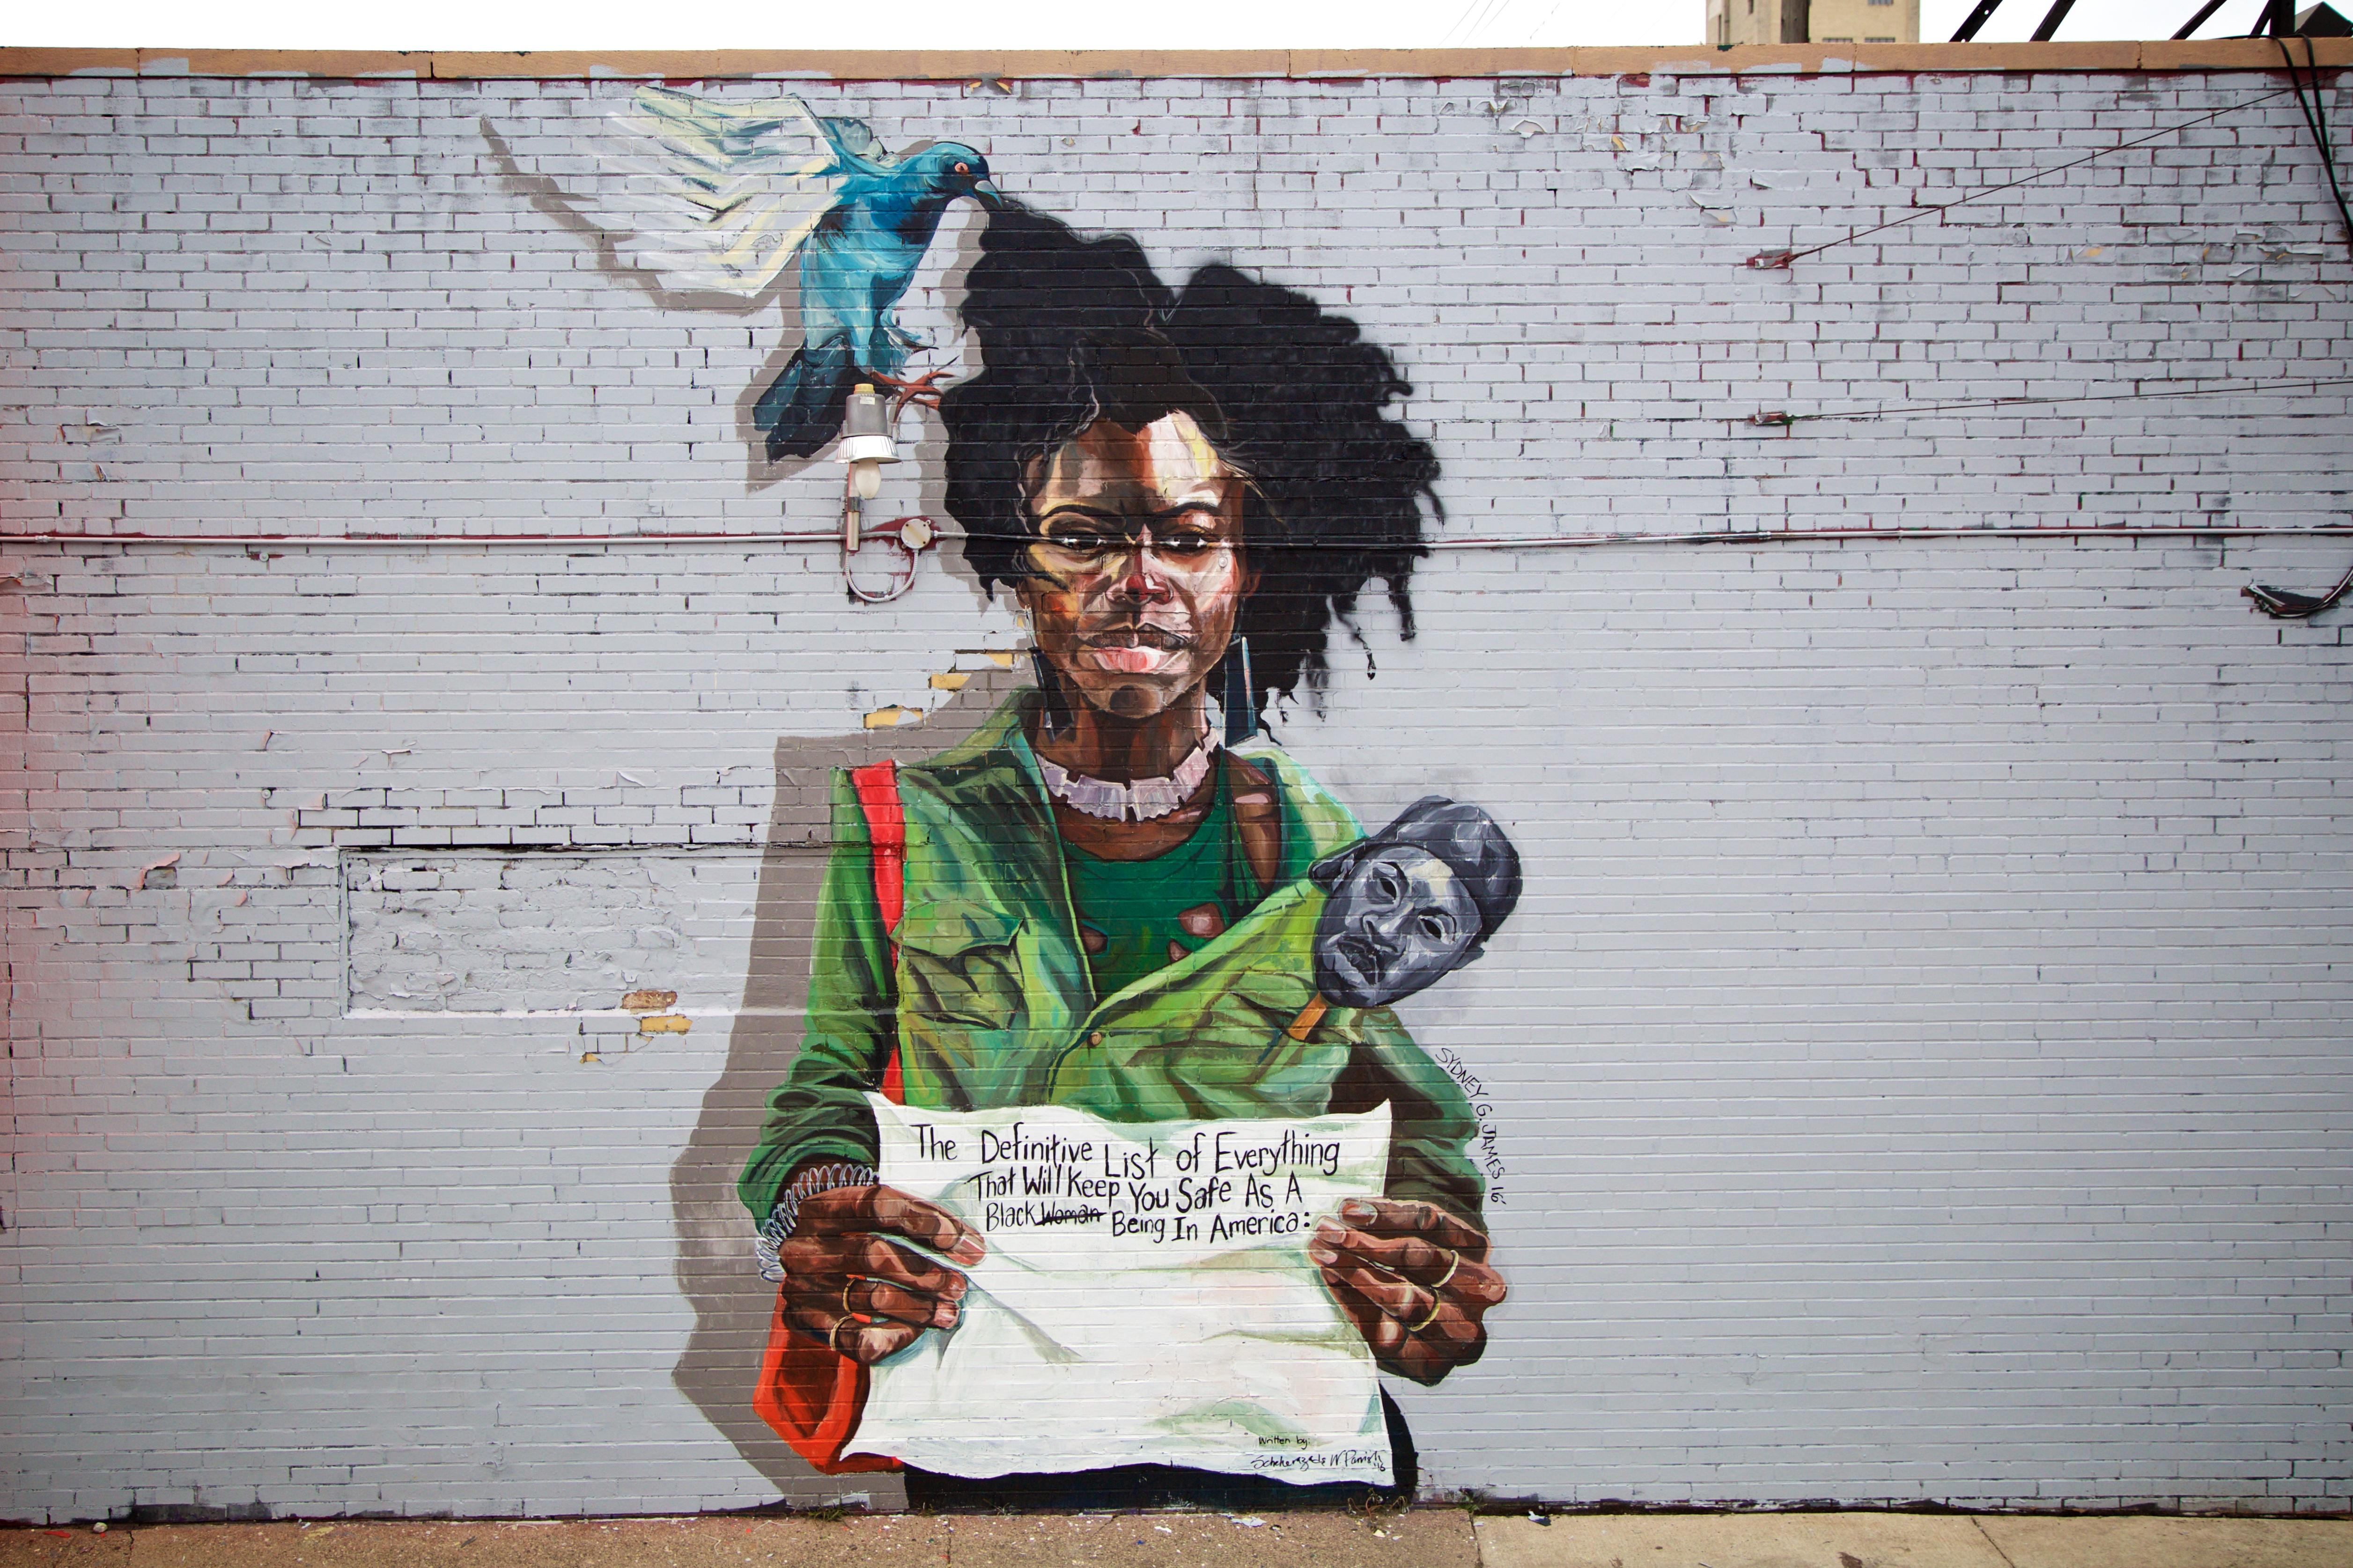 sydney-james_muralsinthemarket_1xrun_finished-walls-1